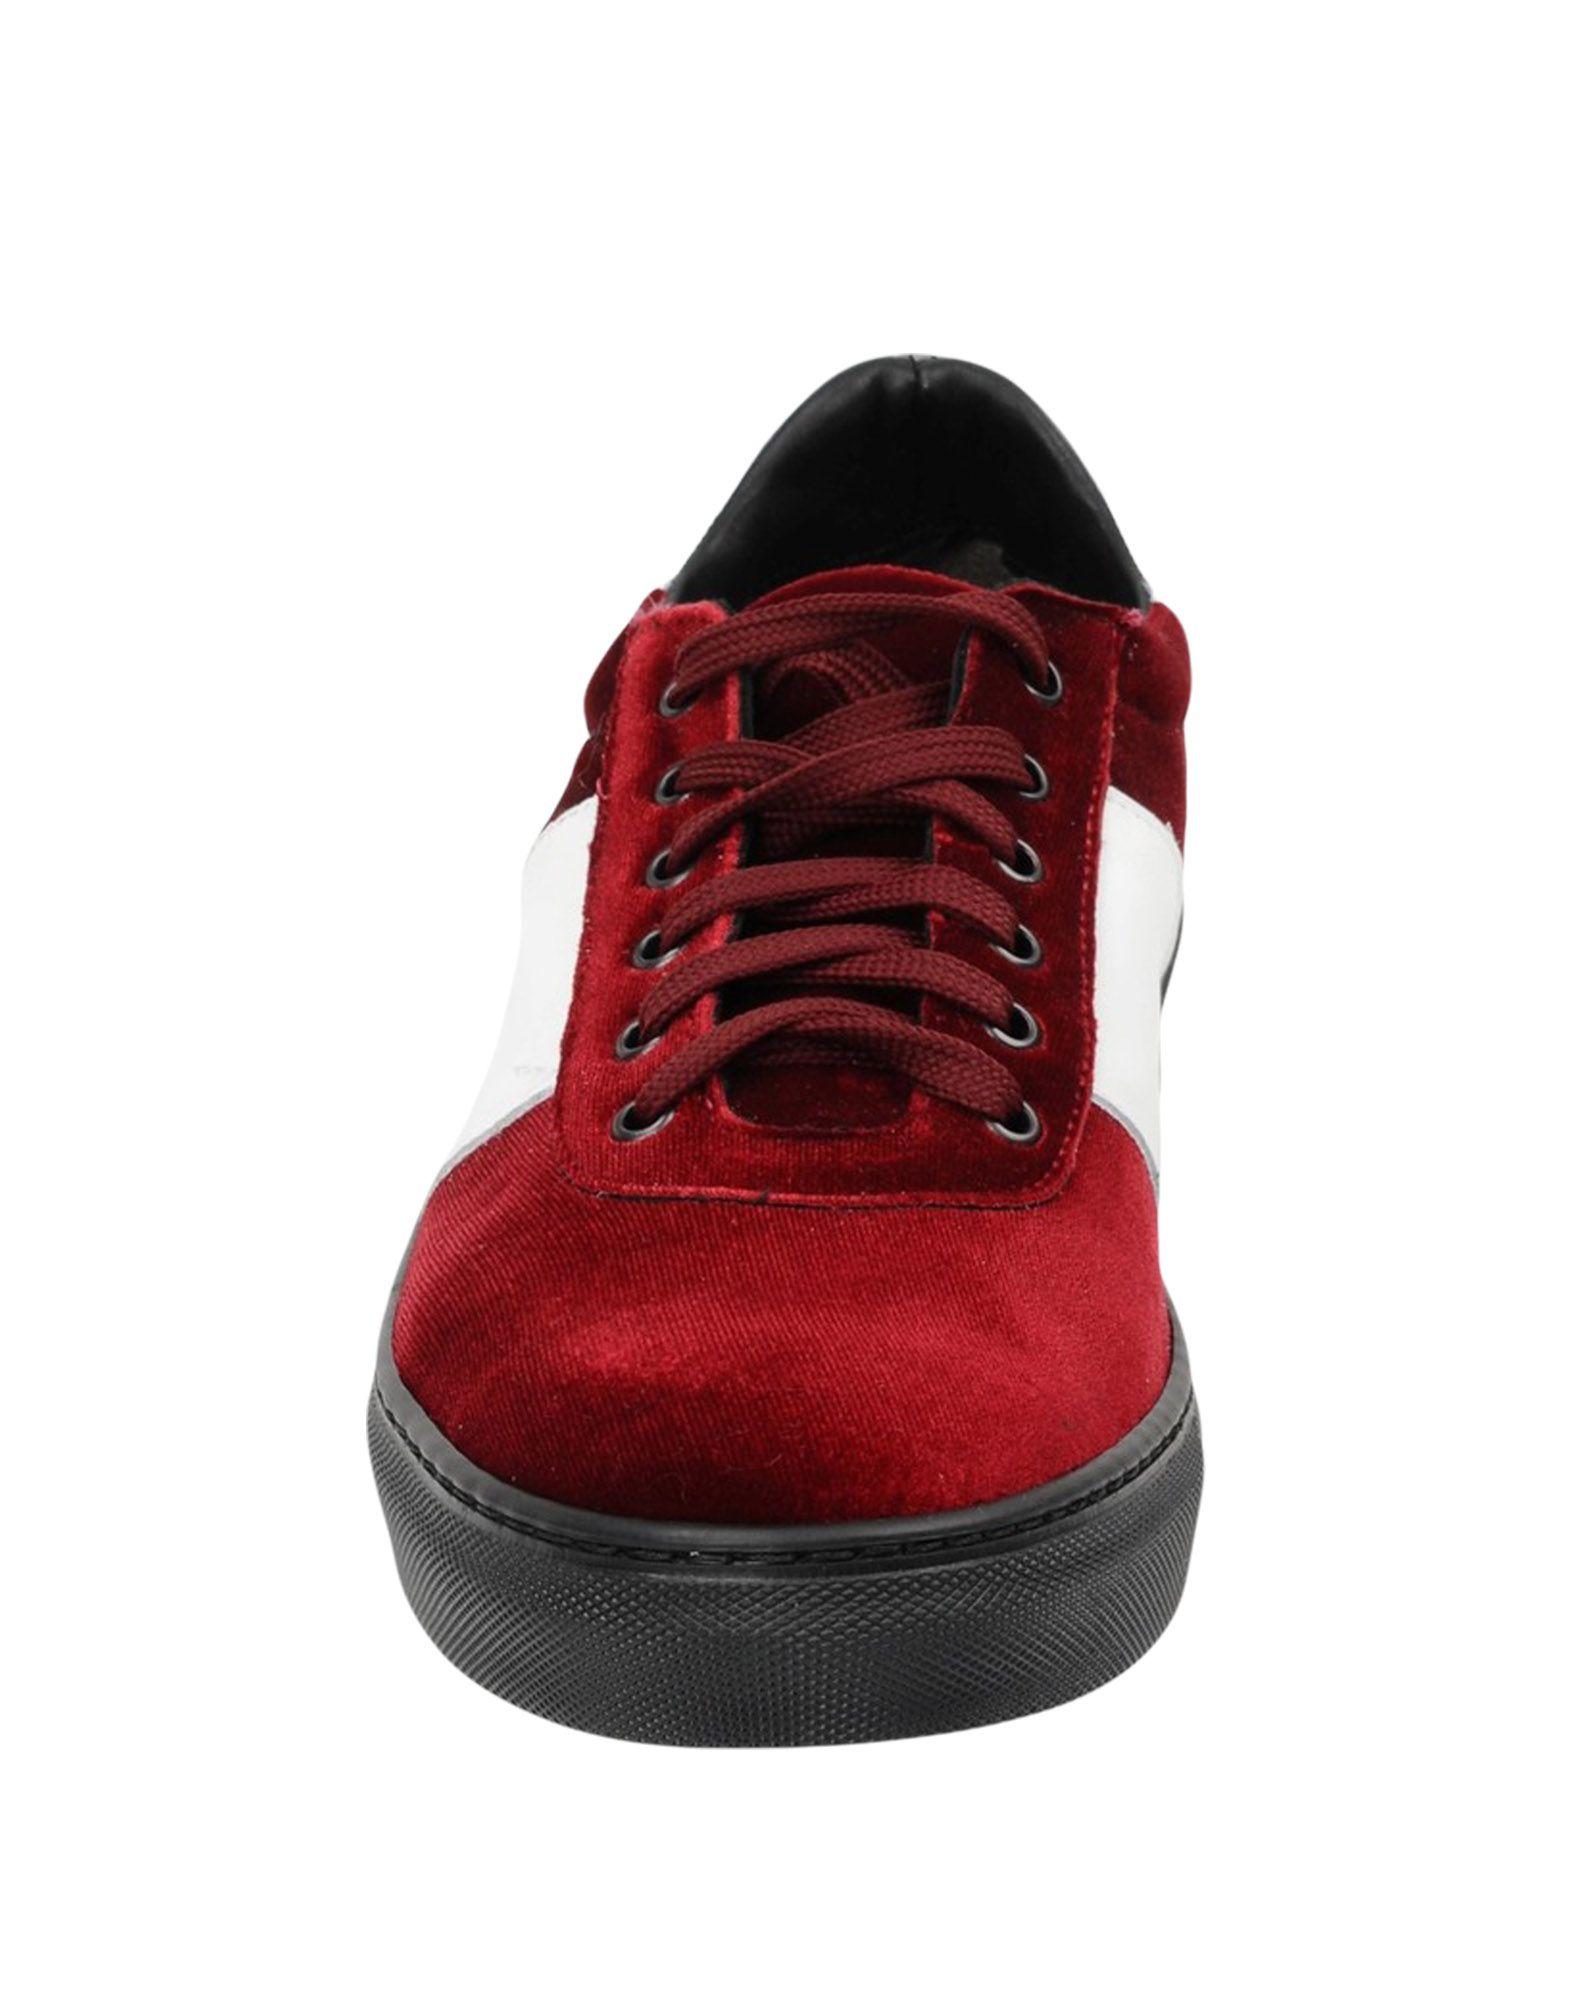 11393315LE 8 Sneakers Herren  11393315LE  Heiße Schuhe 0fb5f3